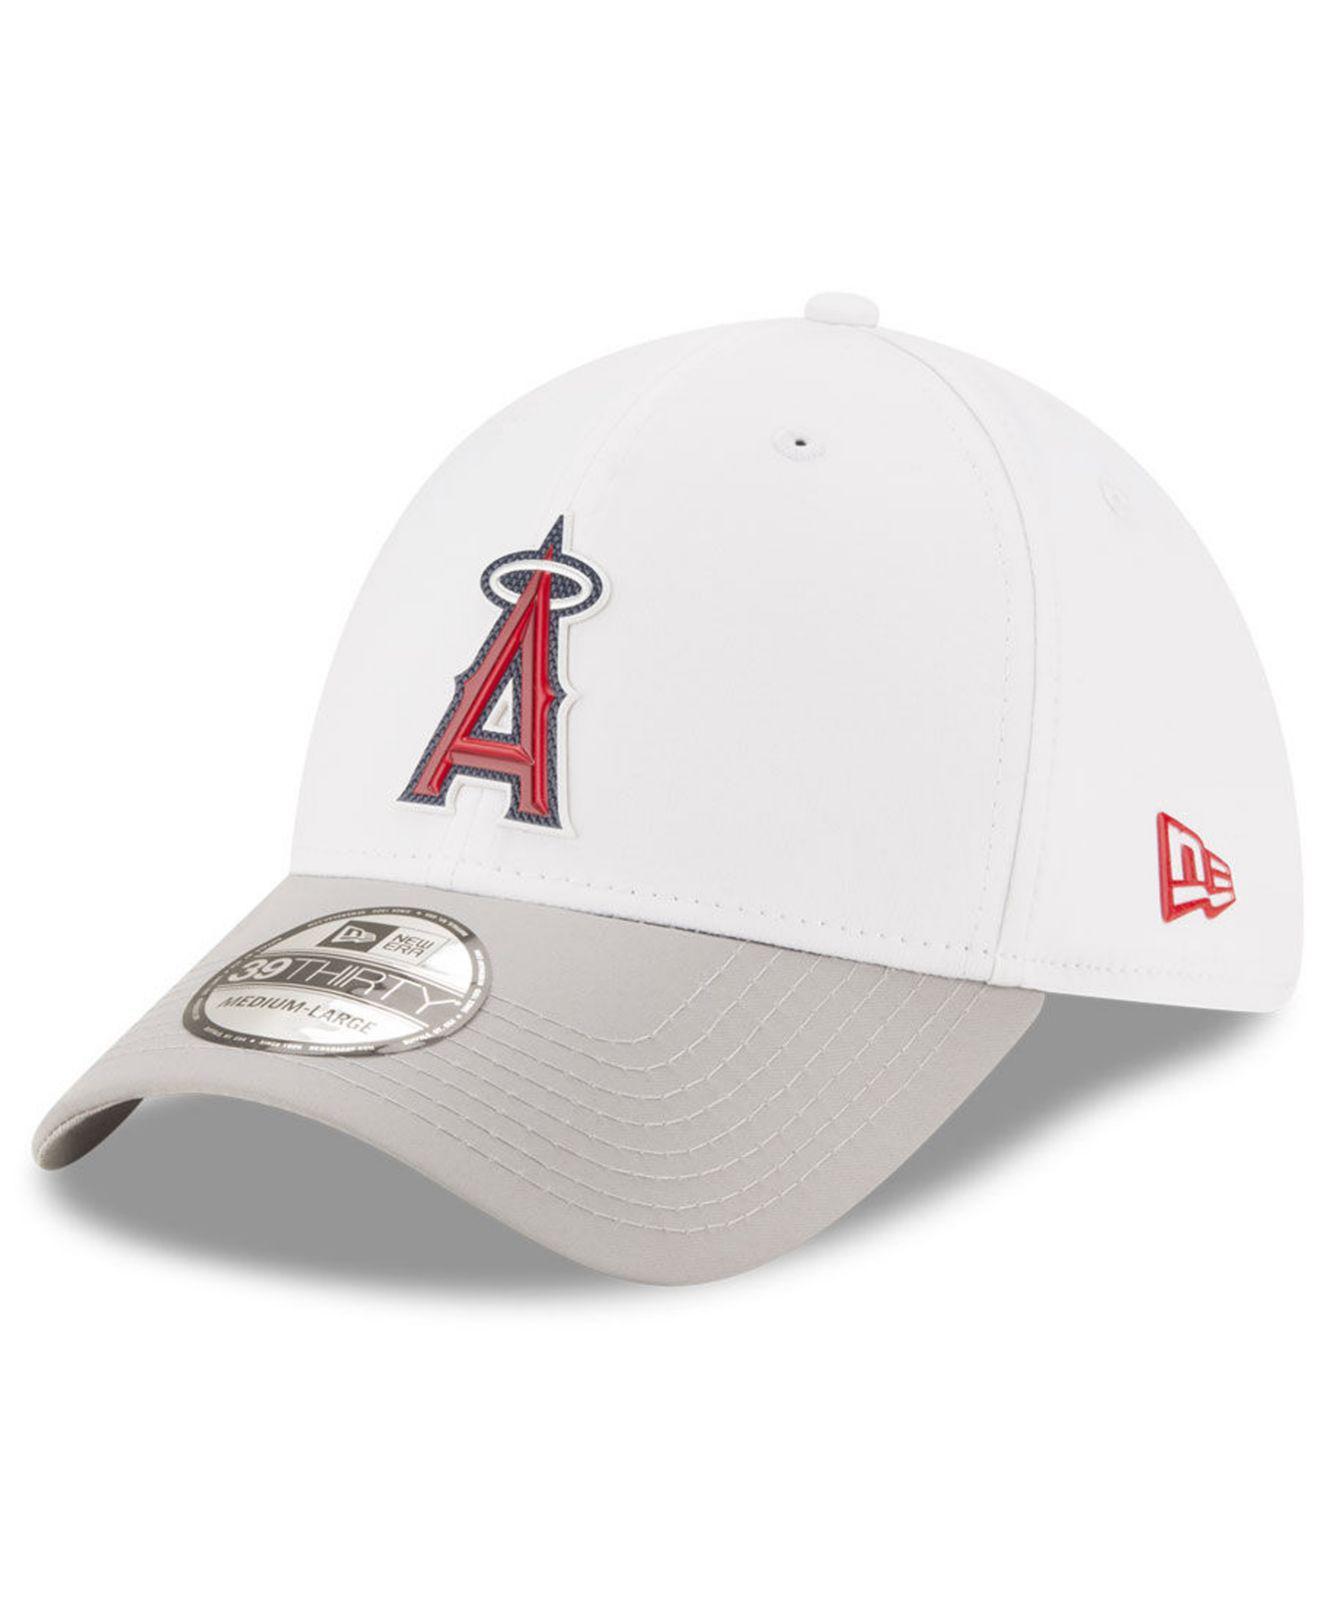 on sale 17076 57737 ... sale ktz los angeles angels white batting practice 39thirty cap for men  lyst. view fullscreen